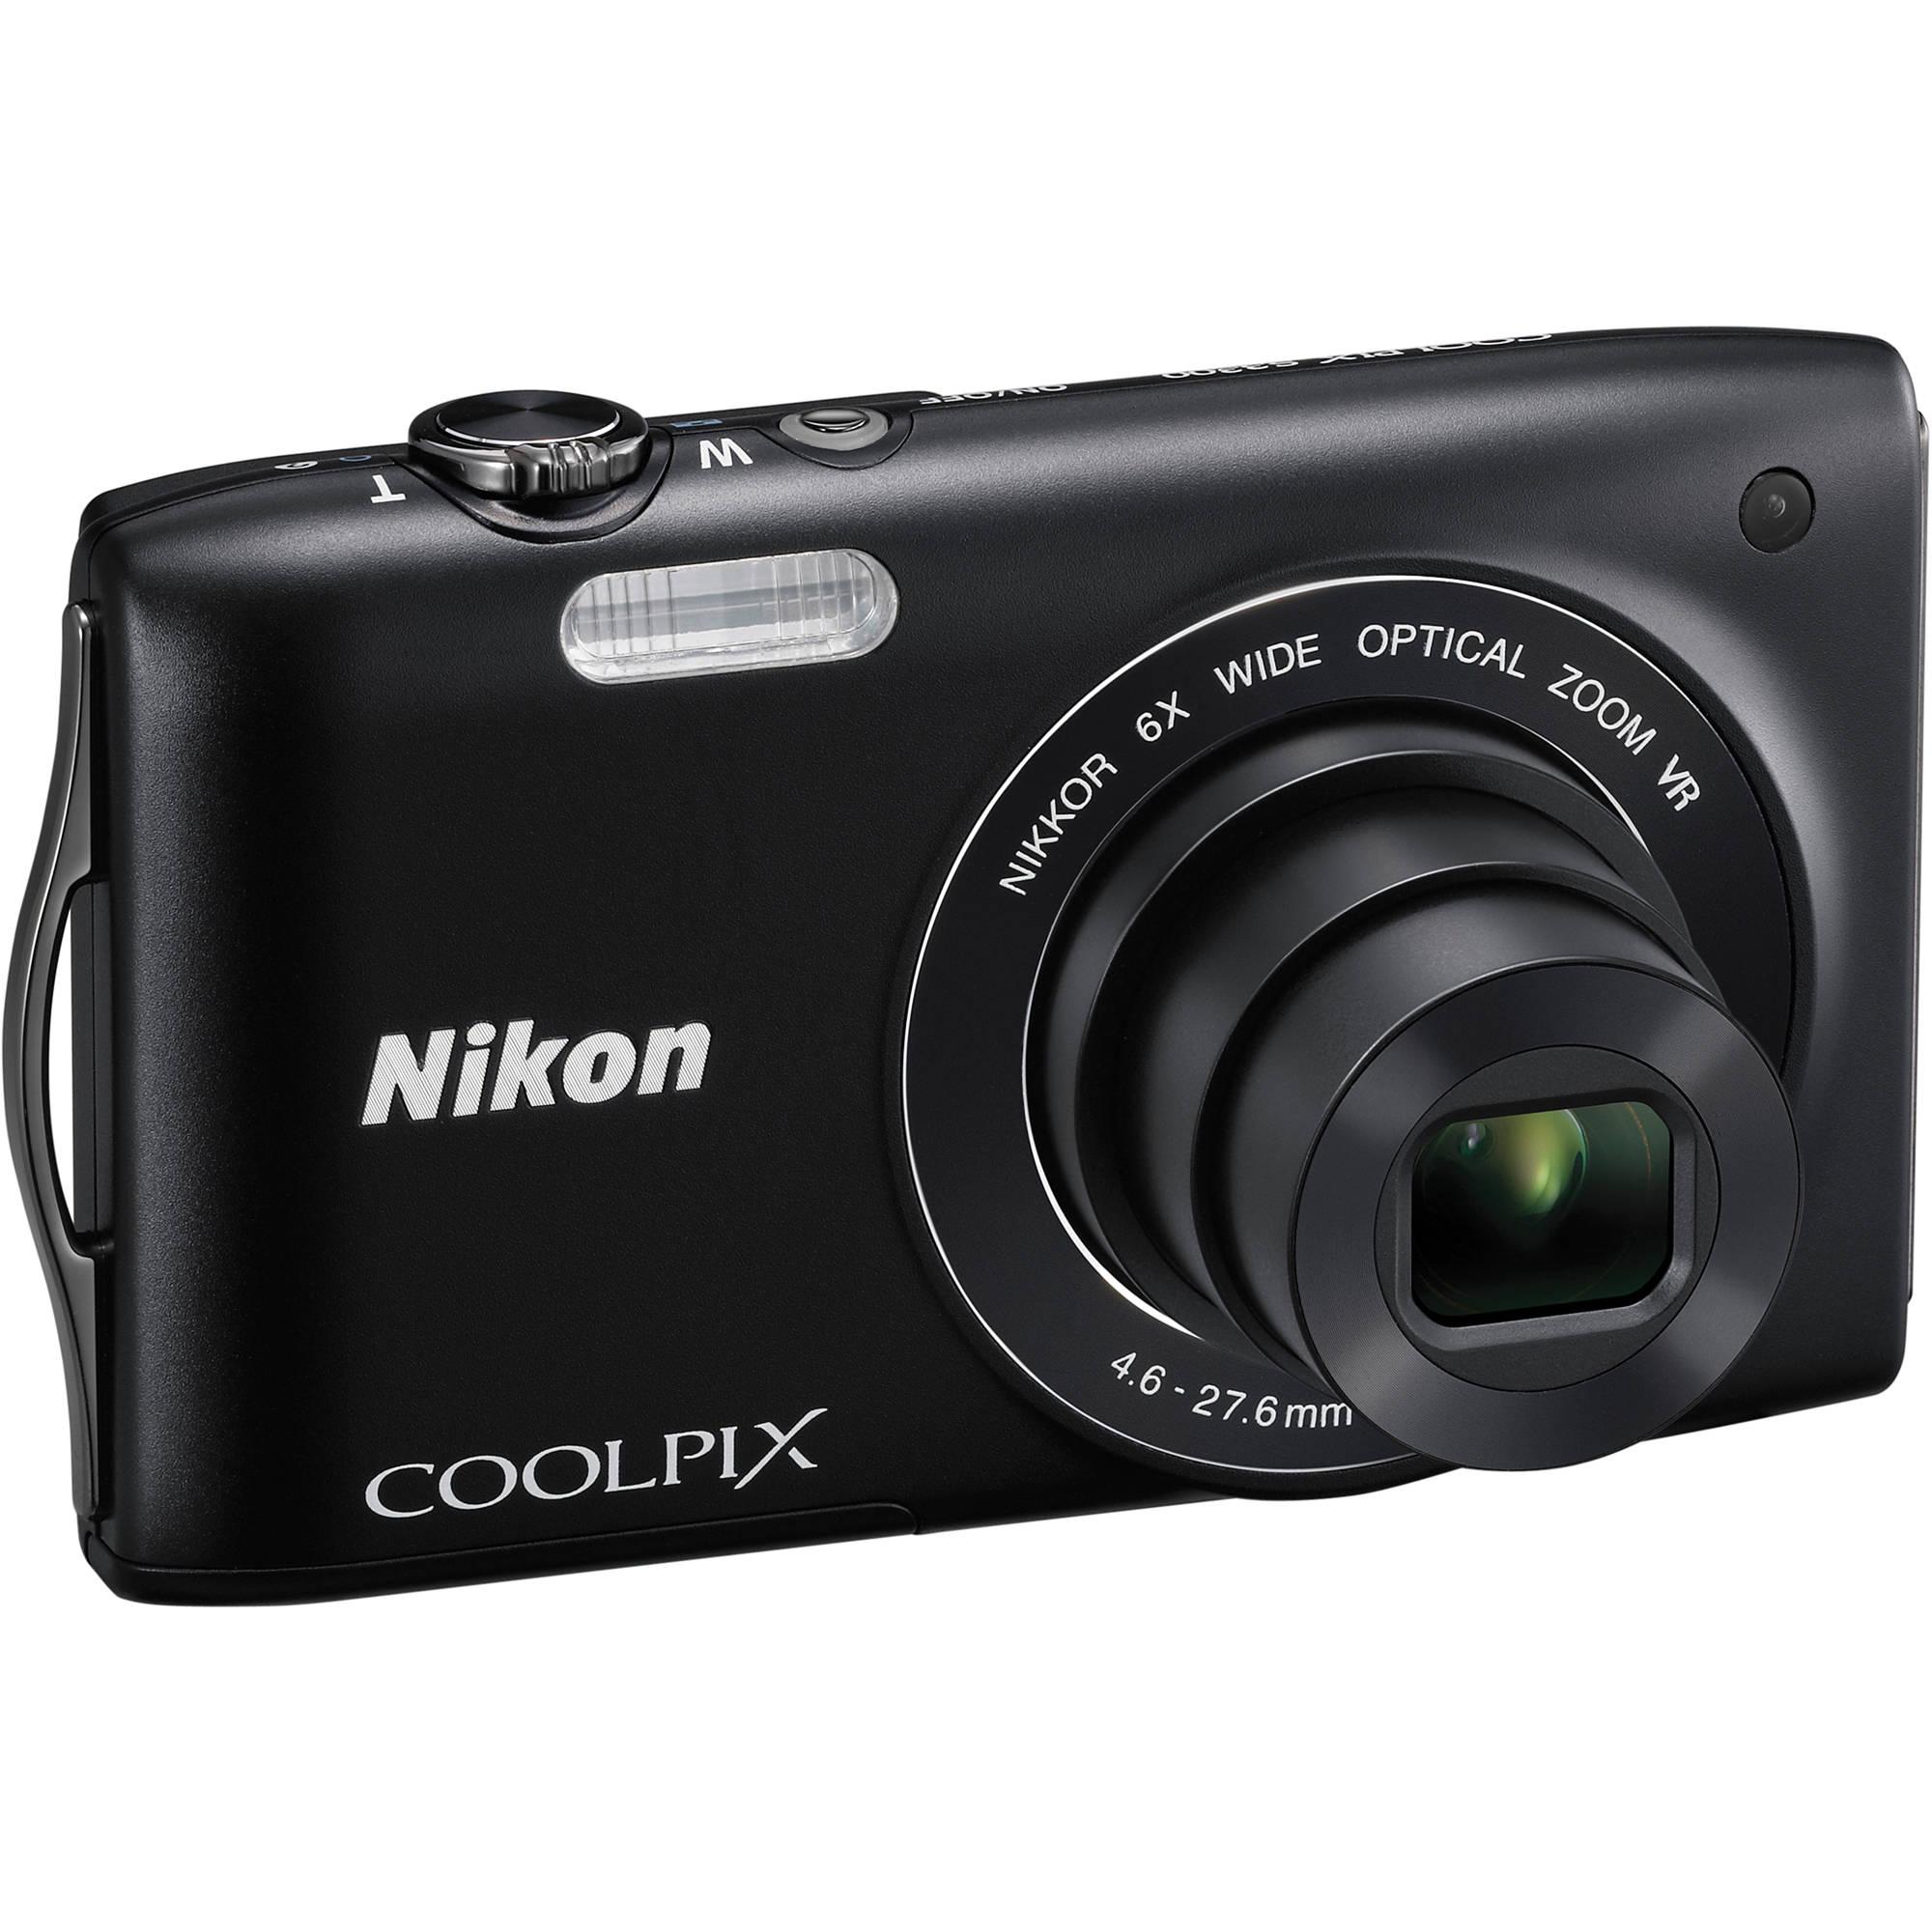 nikon coolpix s3300 digital camera black 26310 b h photo video rh bhphotovideo com nikon coolpix s33 instruction manual Nikon Coolpix S3500